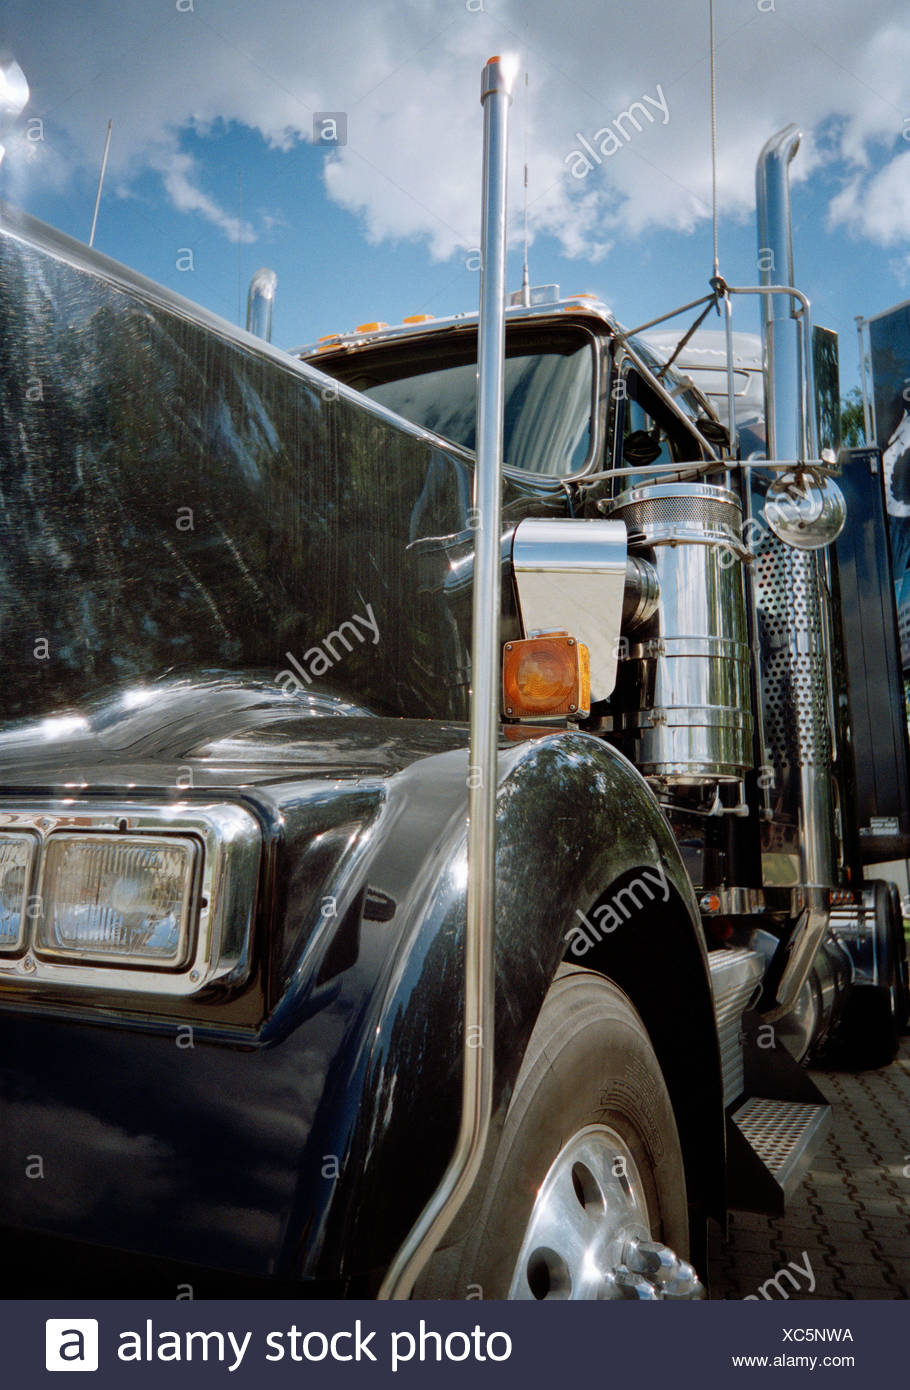 https www alamy com close up of semi truck image282868694 html